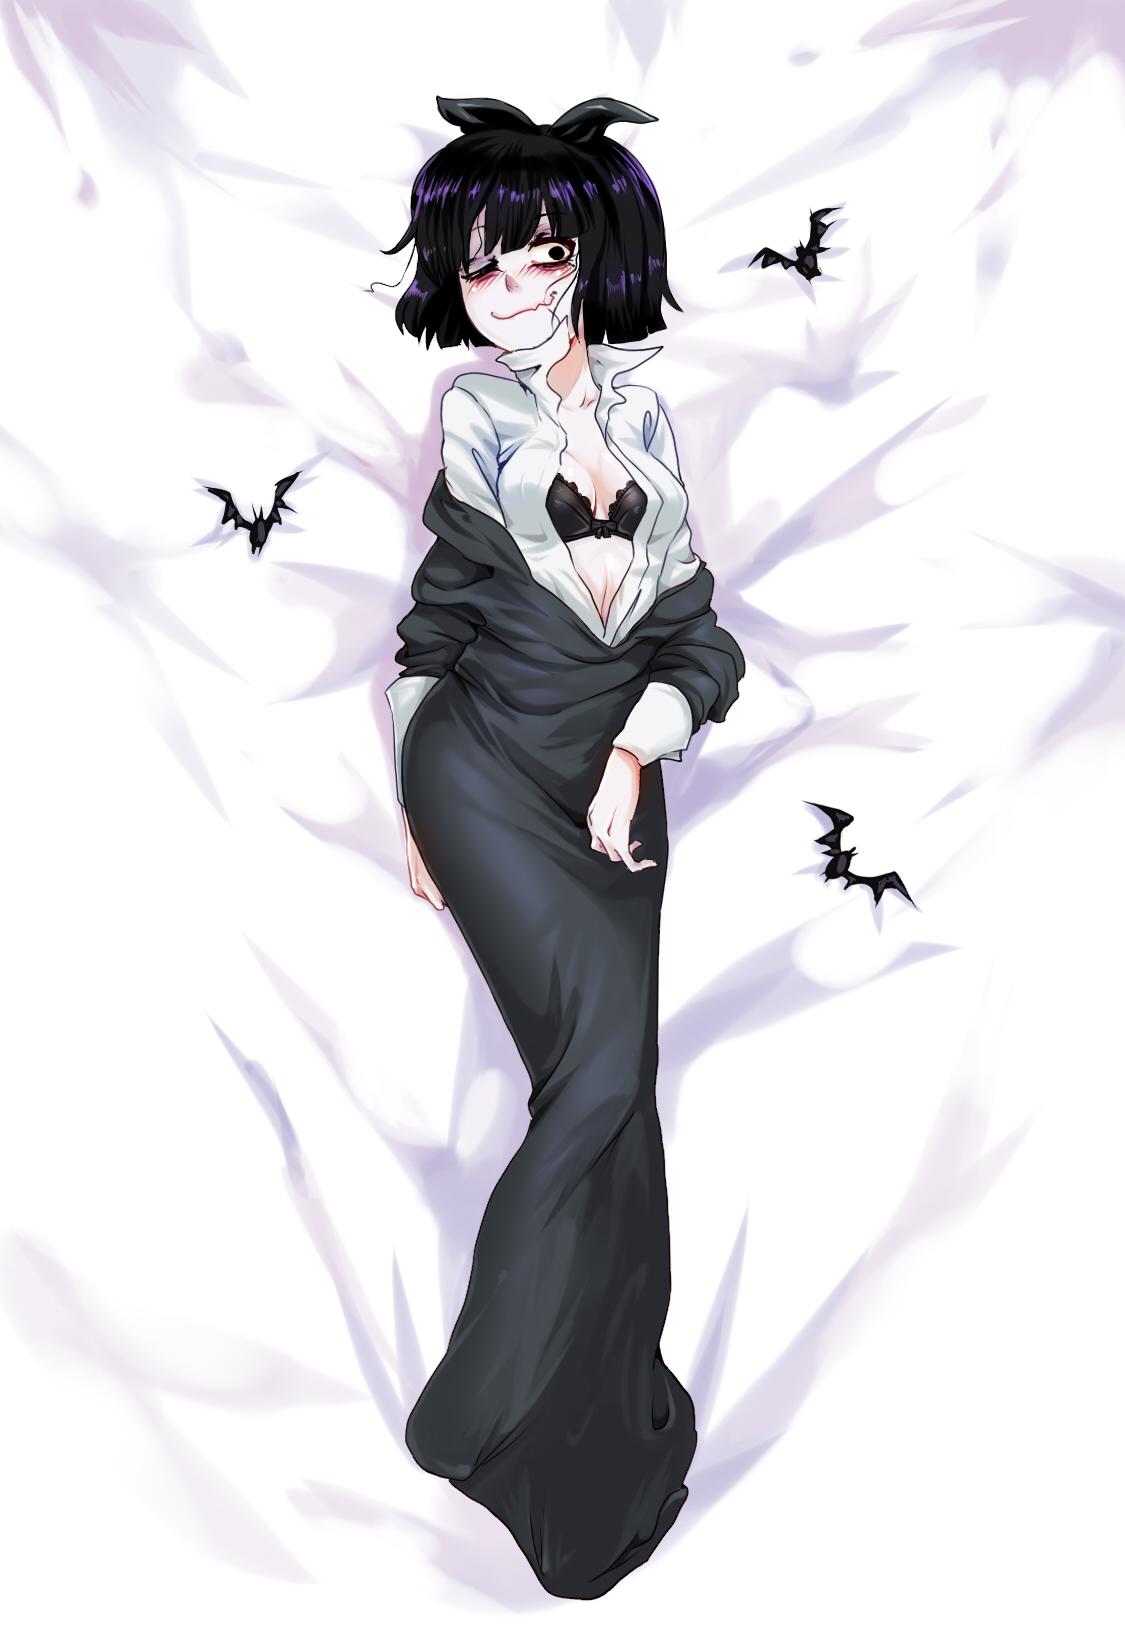 creepy susie body pillow dakimakura body pillow know your meme